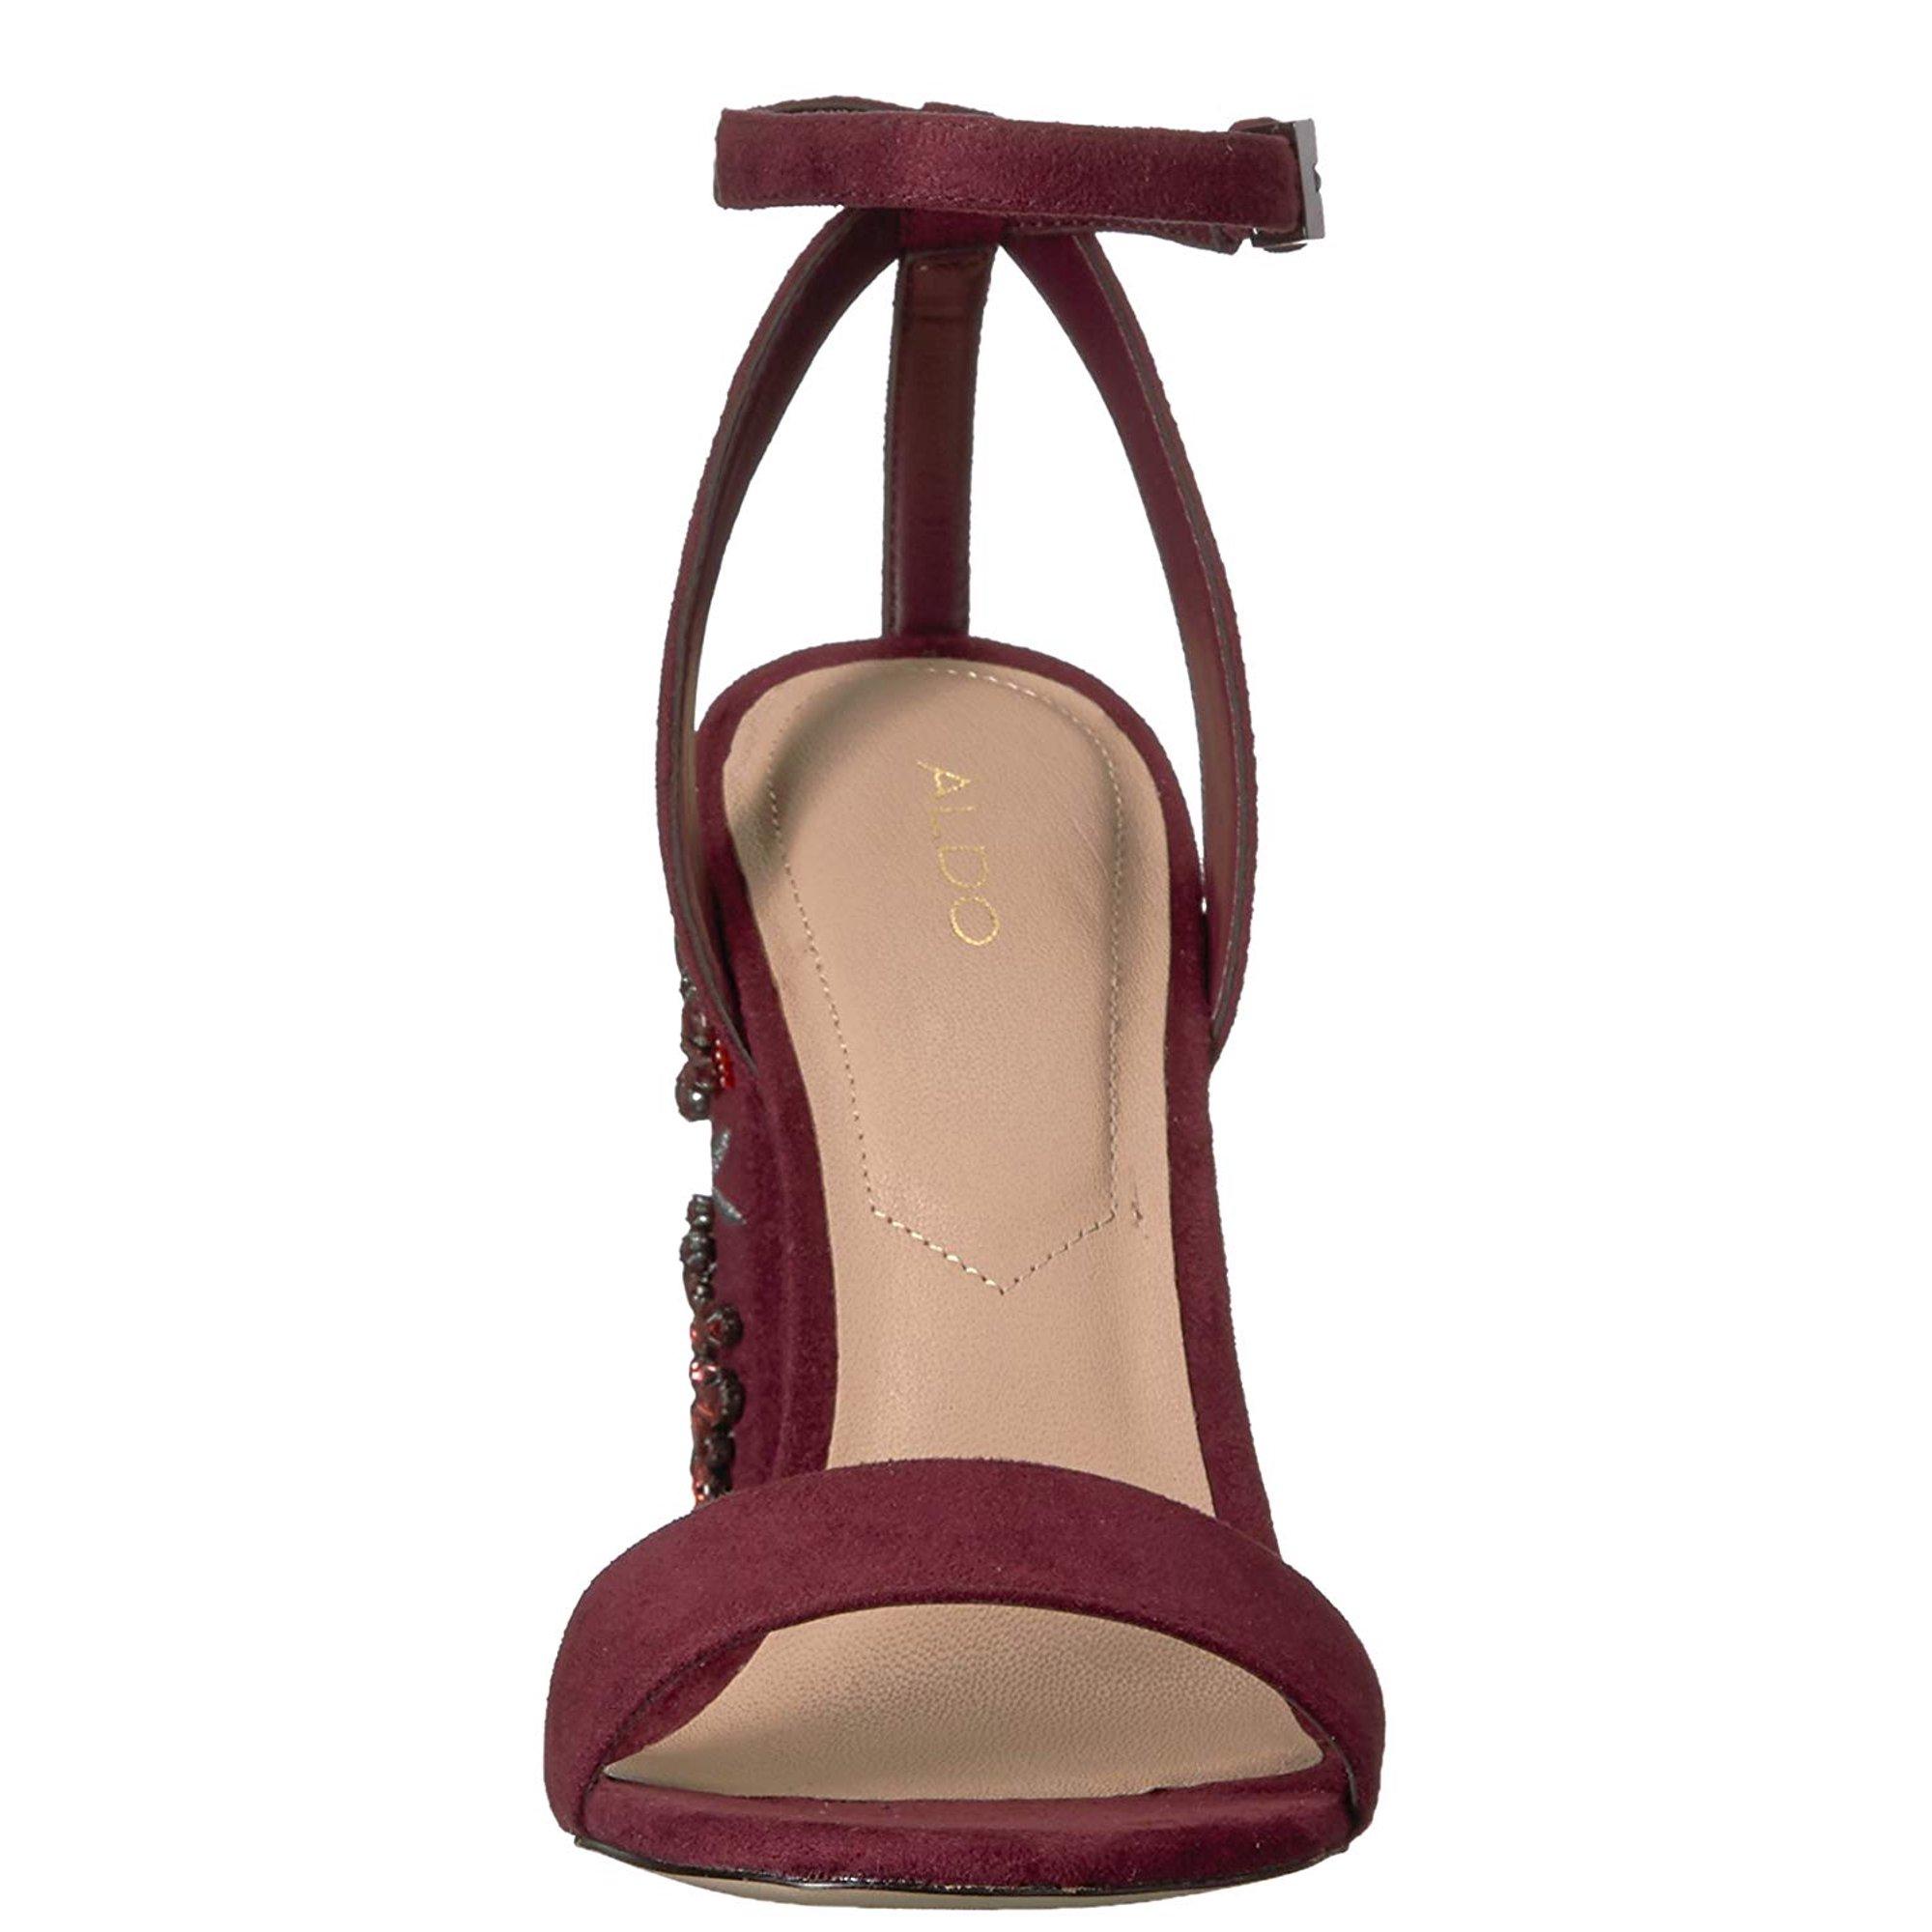 8c9c646b3d9 ALDO Women s Luciaa Dress Sandal